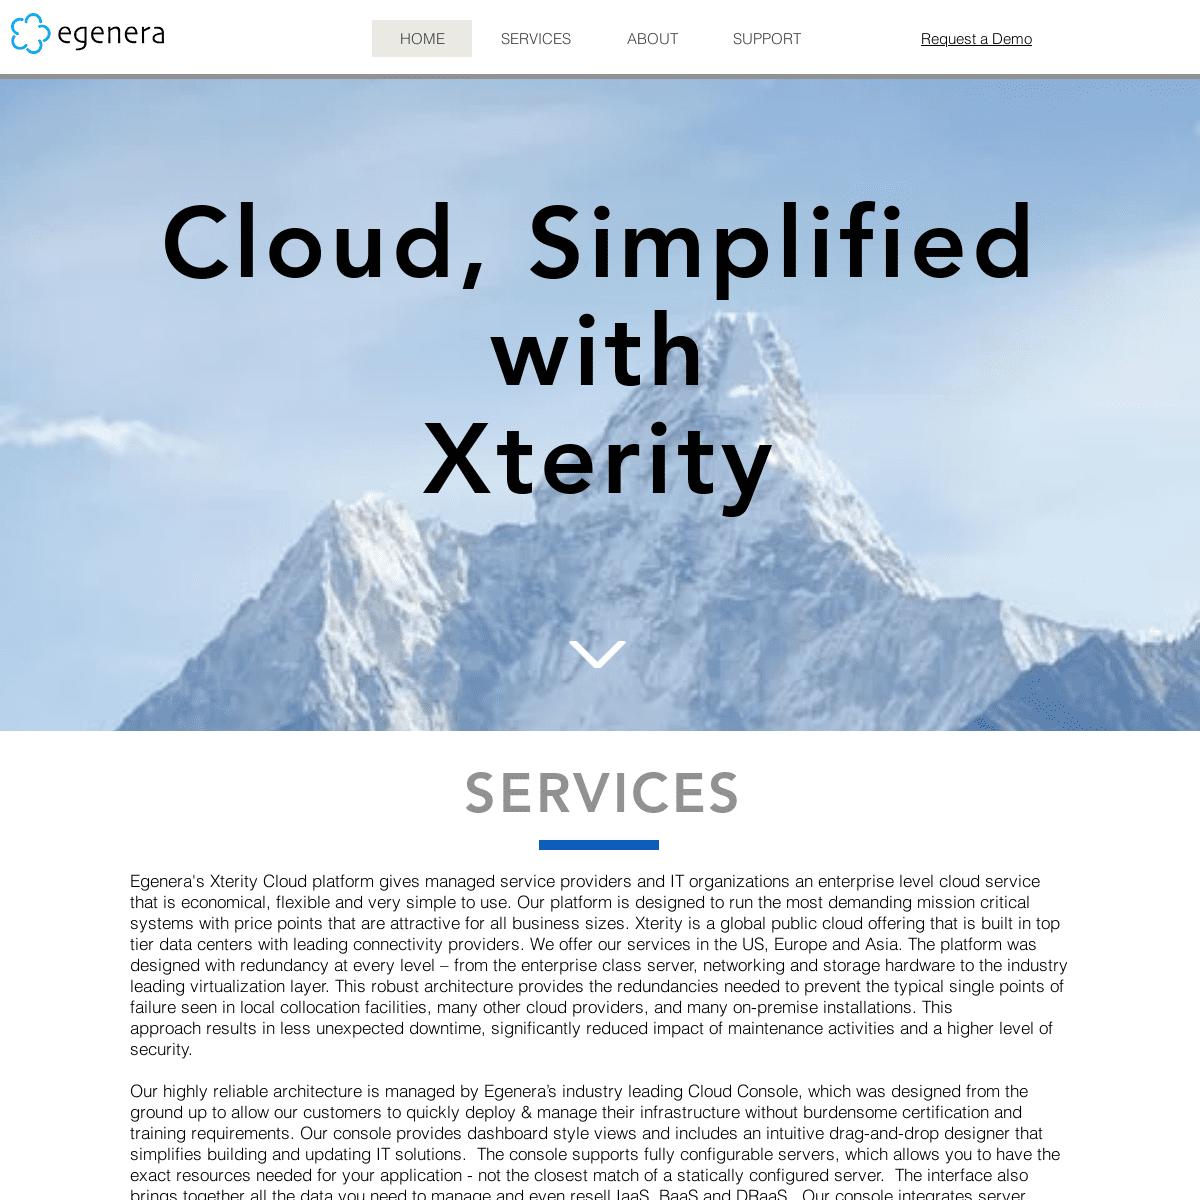 Cloud IaaS Provider simpler than AWS and Azure - Egenera Xterity Cloud